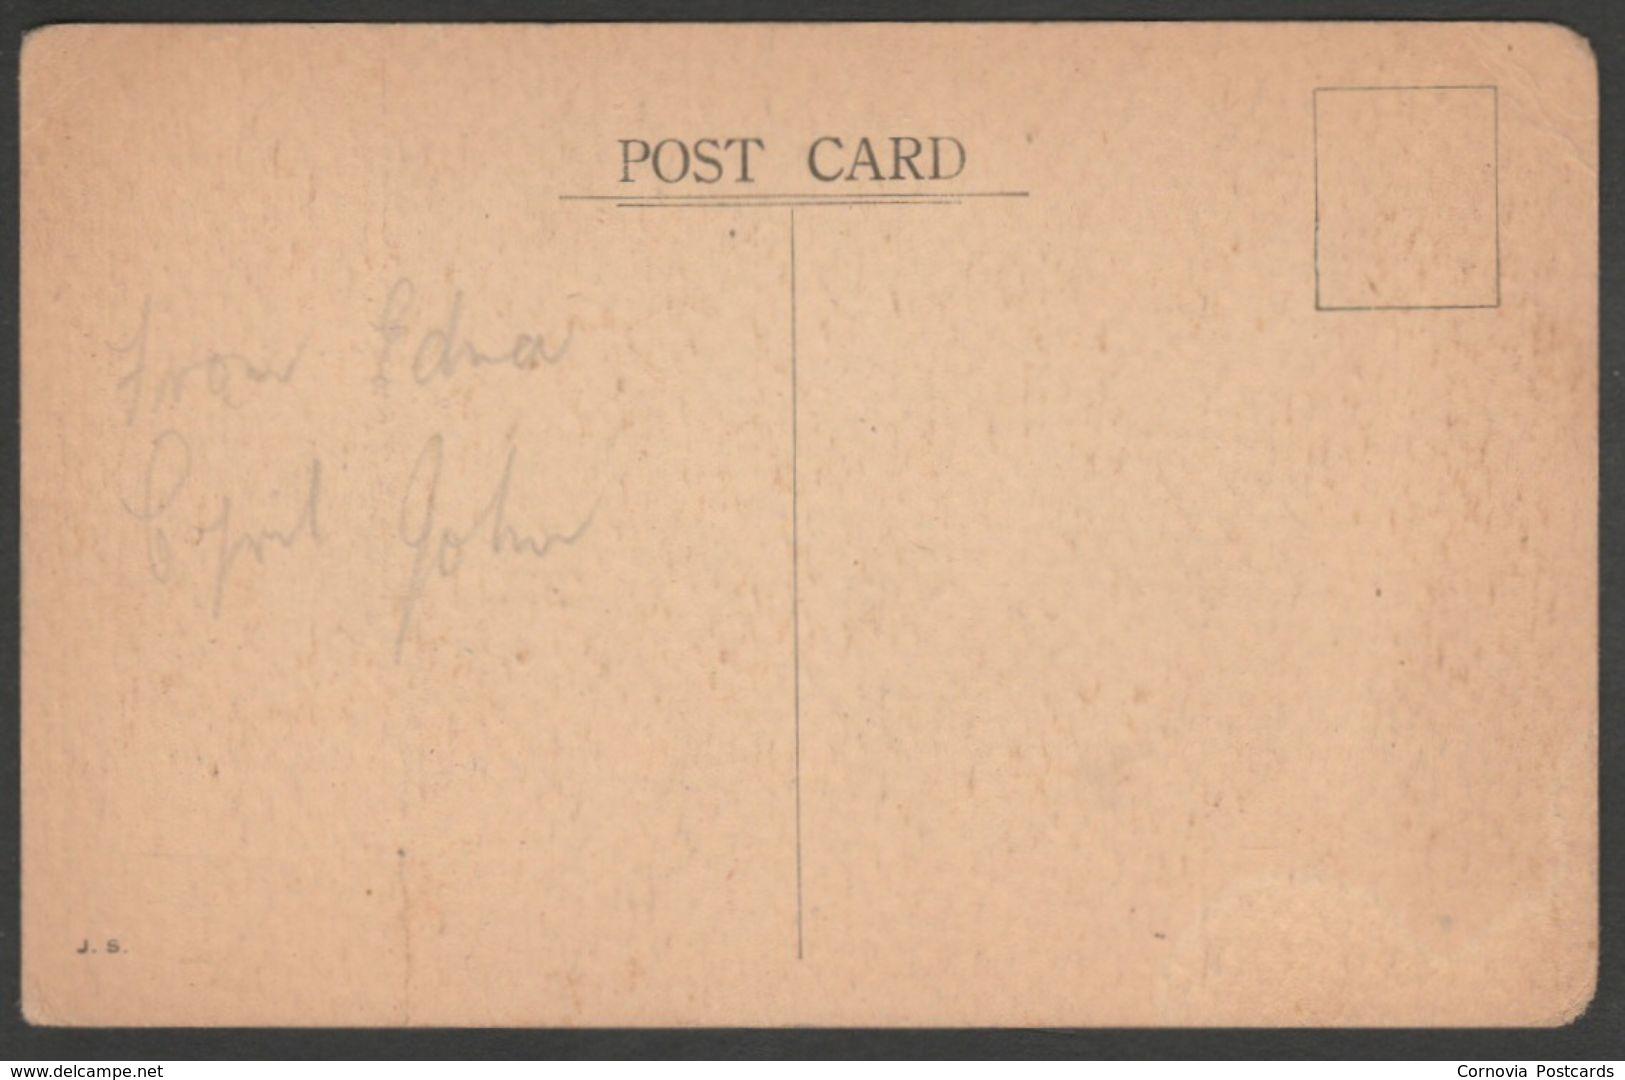 Victoria Square, Adelaide, Australia, C1940 - J.S. Postcard - Adelaide